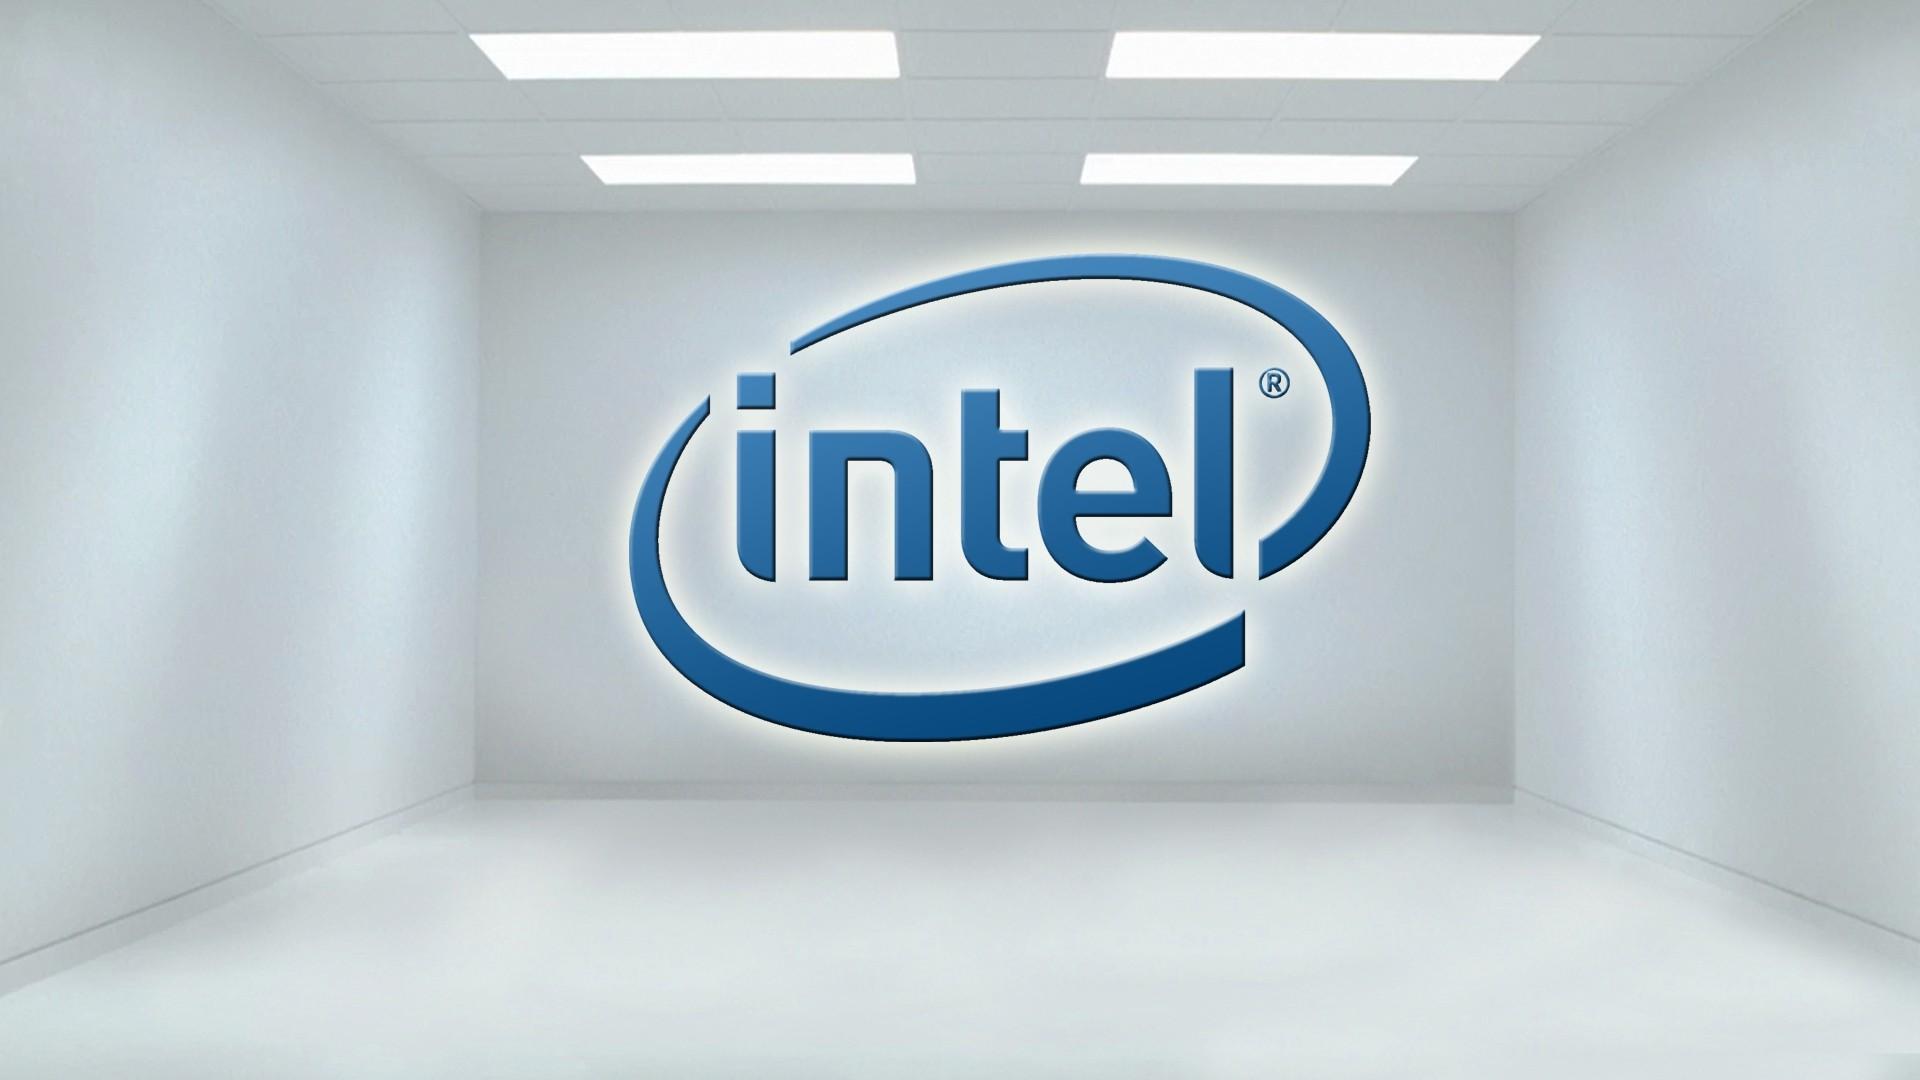 Intel Wallpaper Full HD